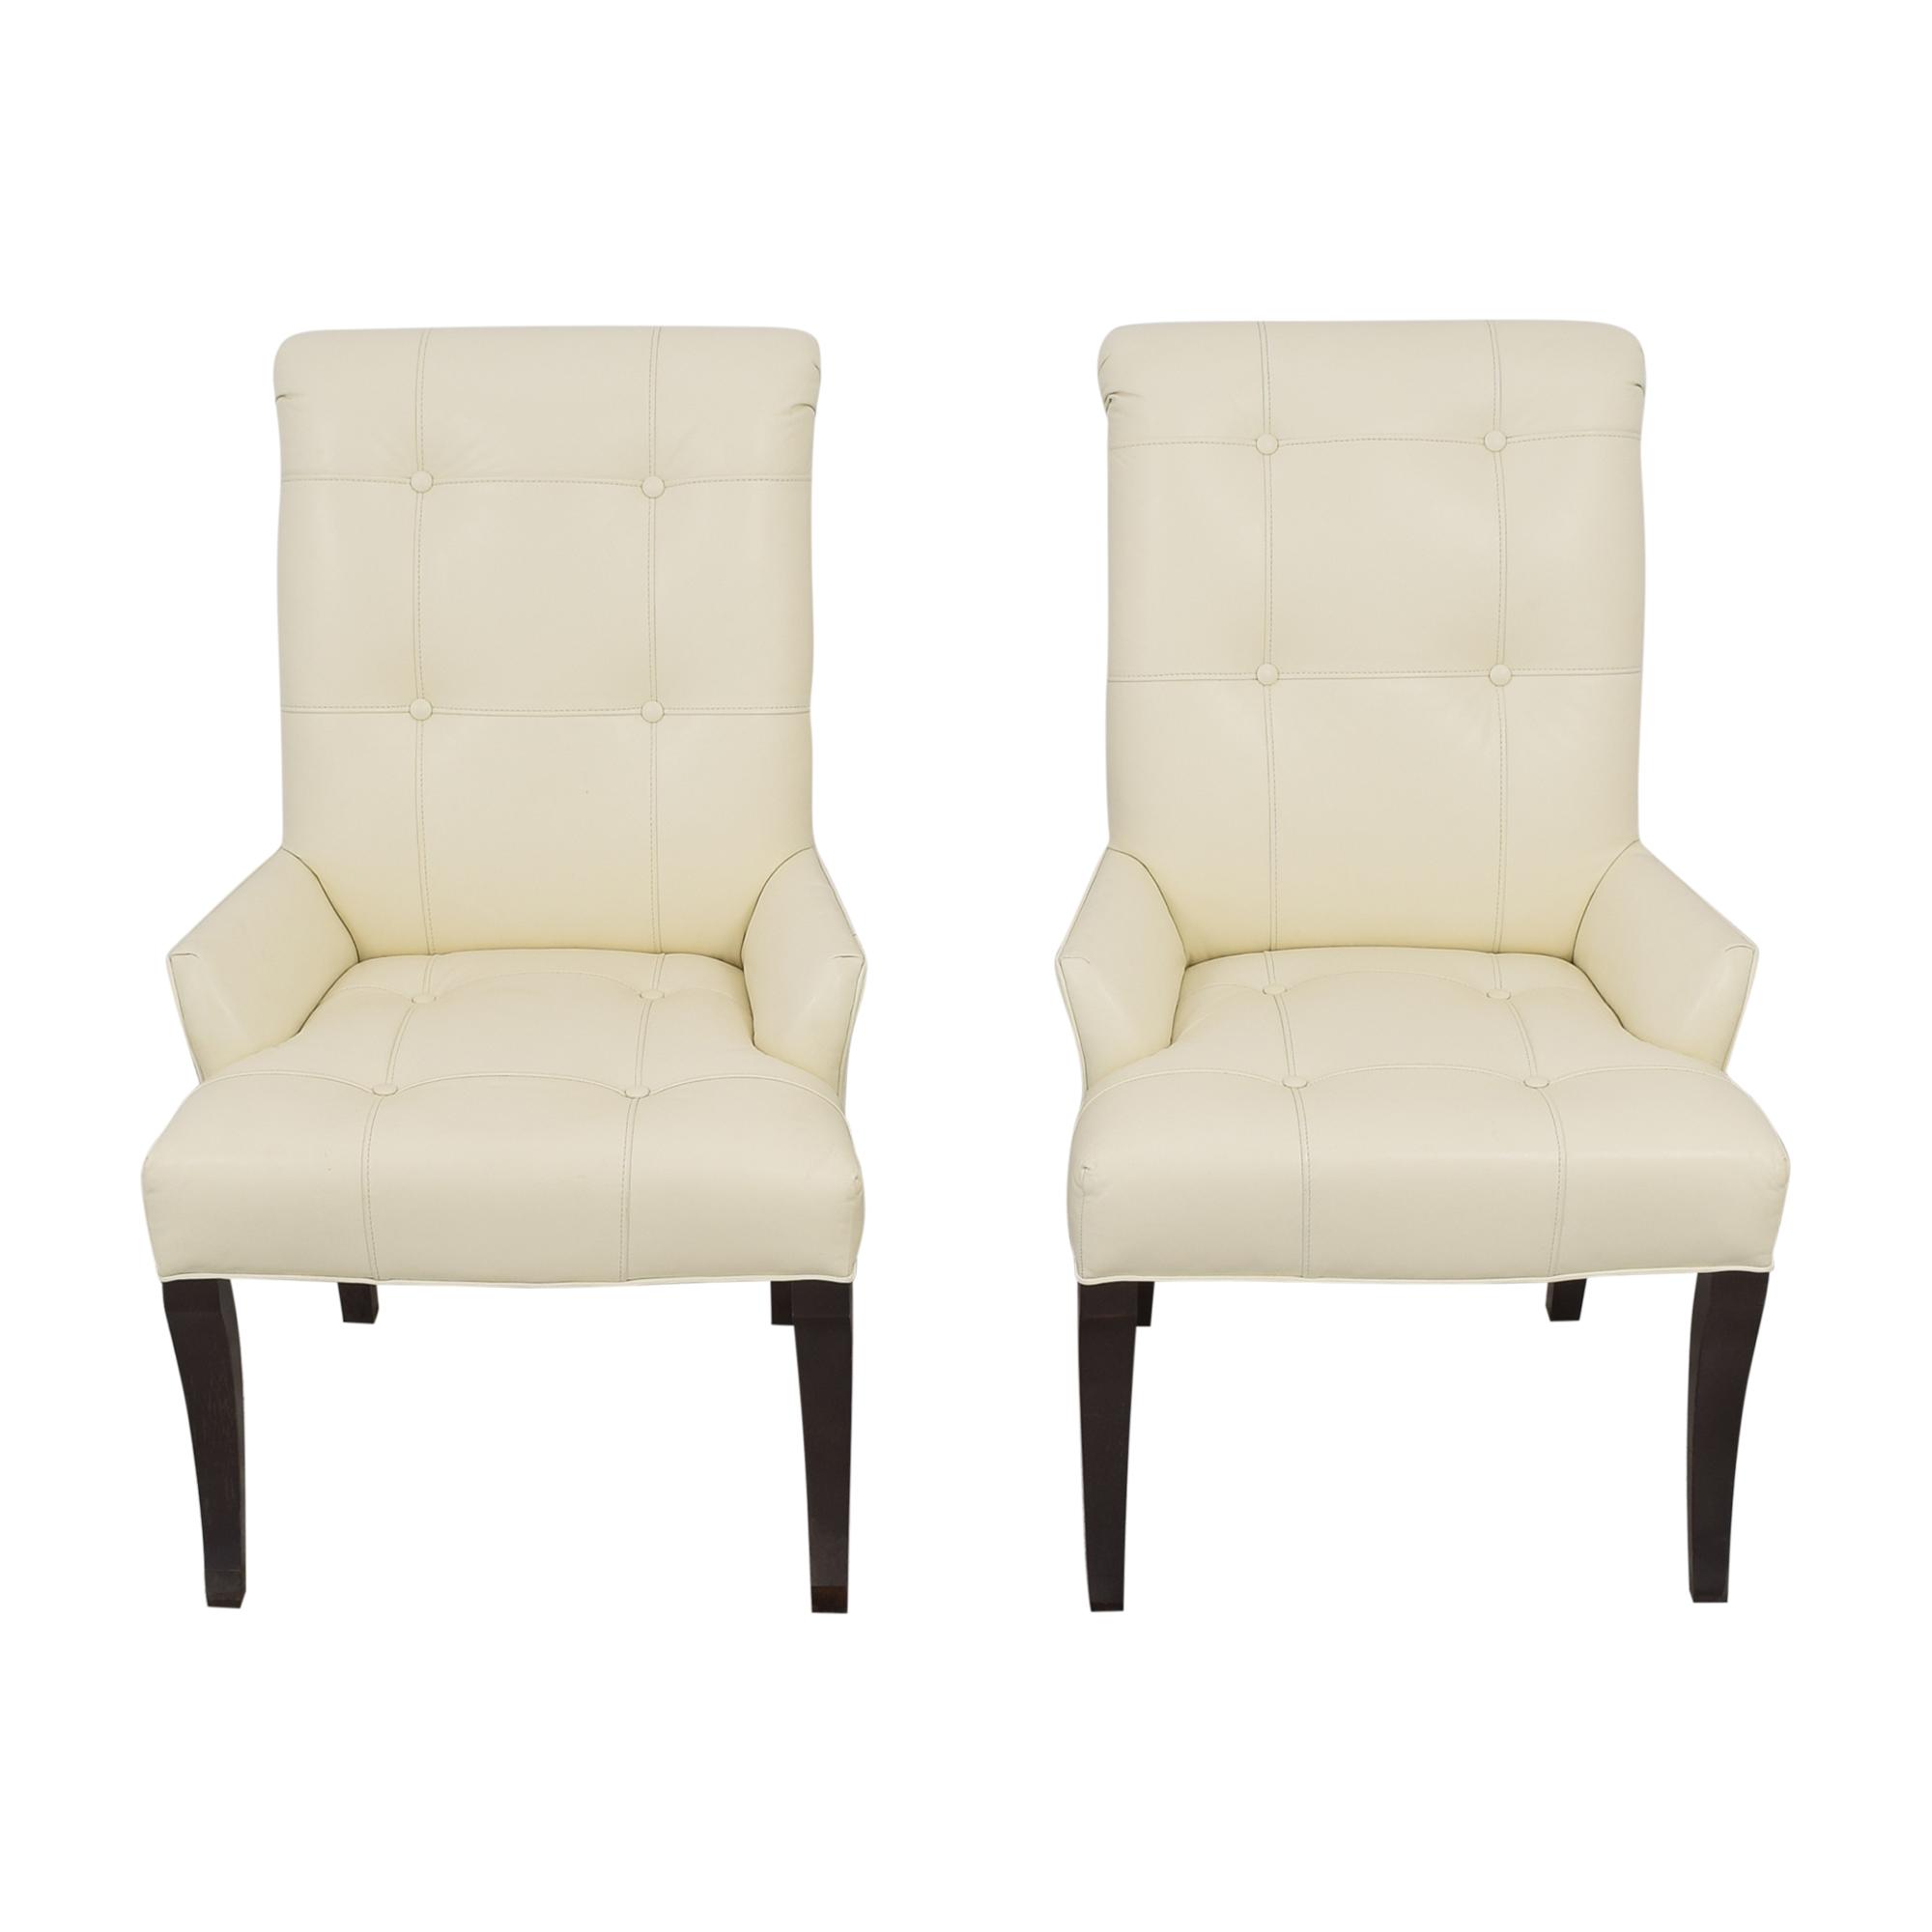 Ethan Allen Ethan Allen Verlaine Dining Armchairs for sale